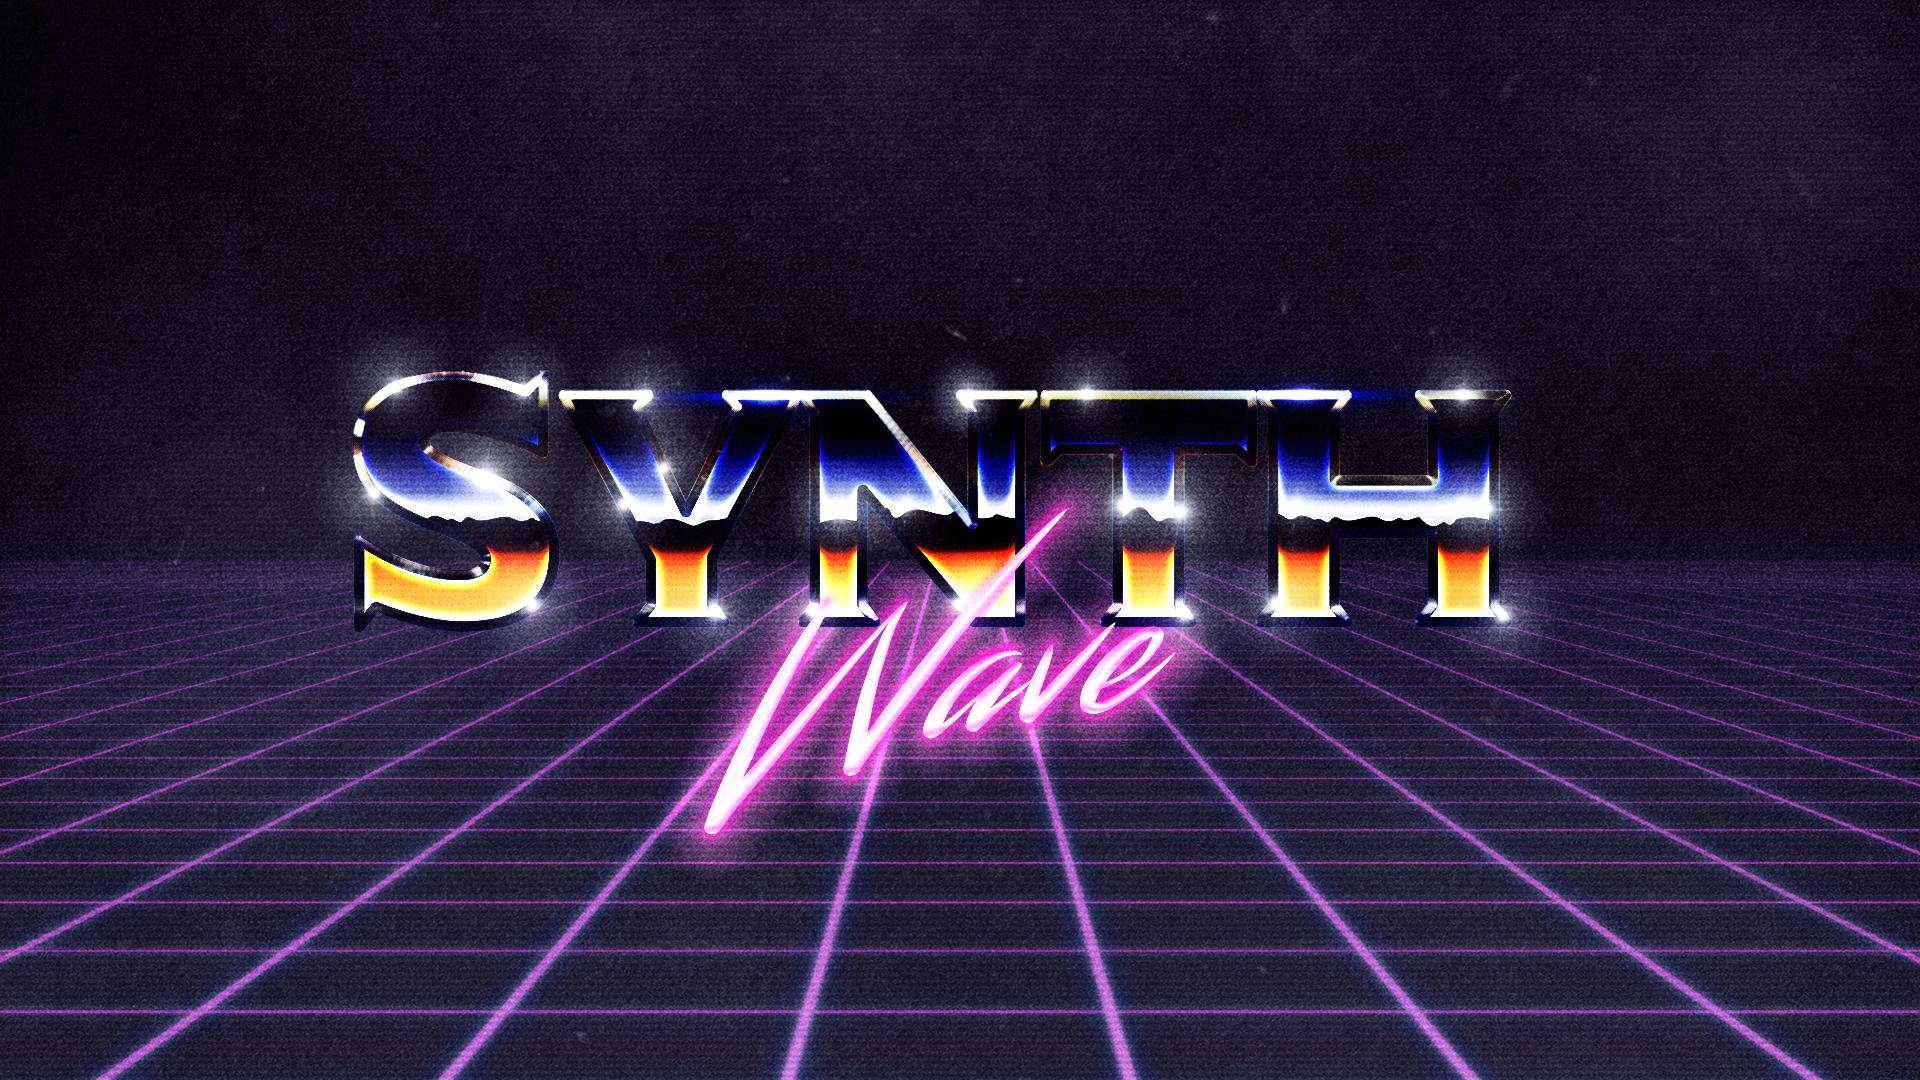 Synth Wave Wallpaper By Halukaliev On Deviantart